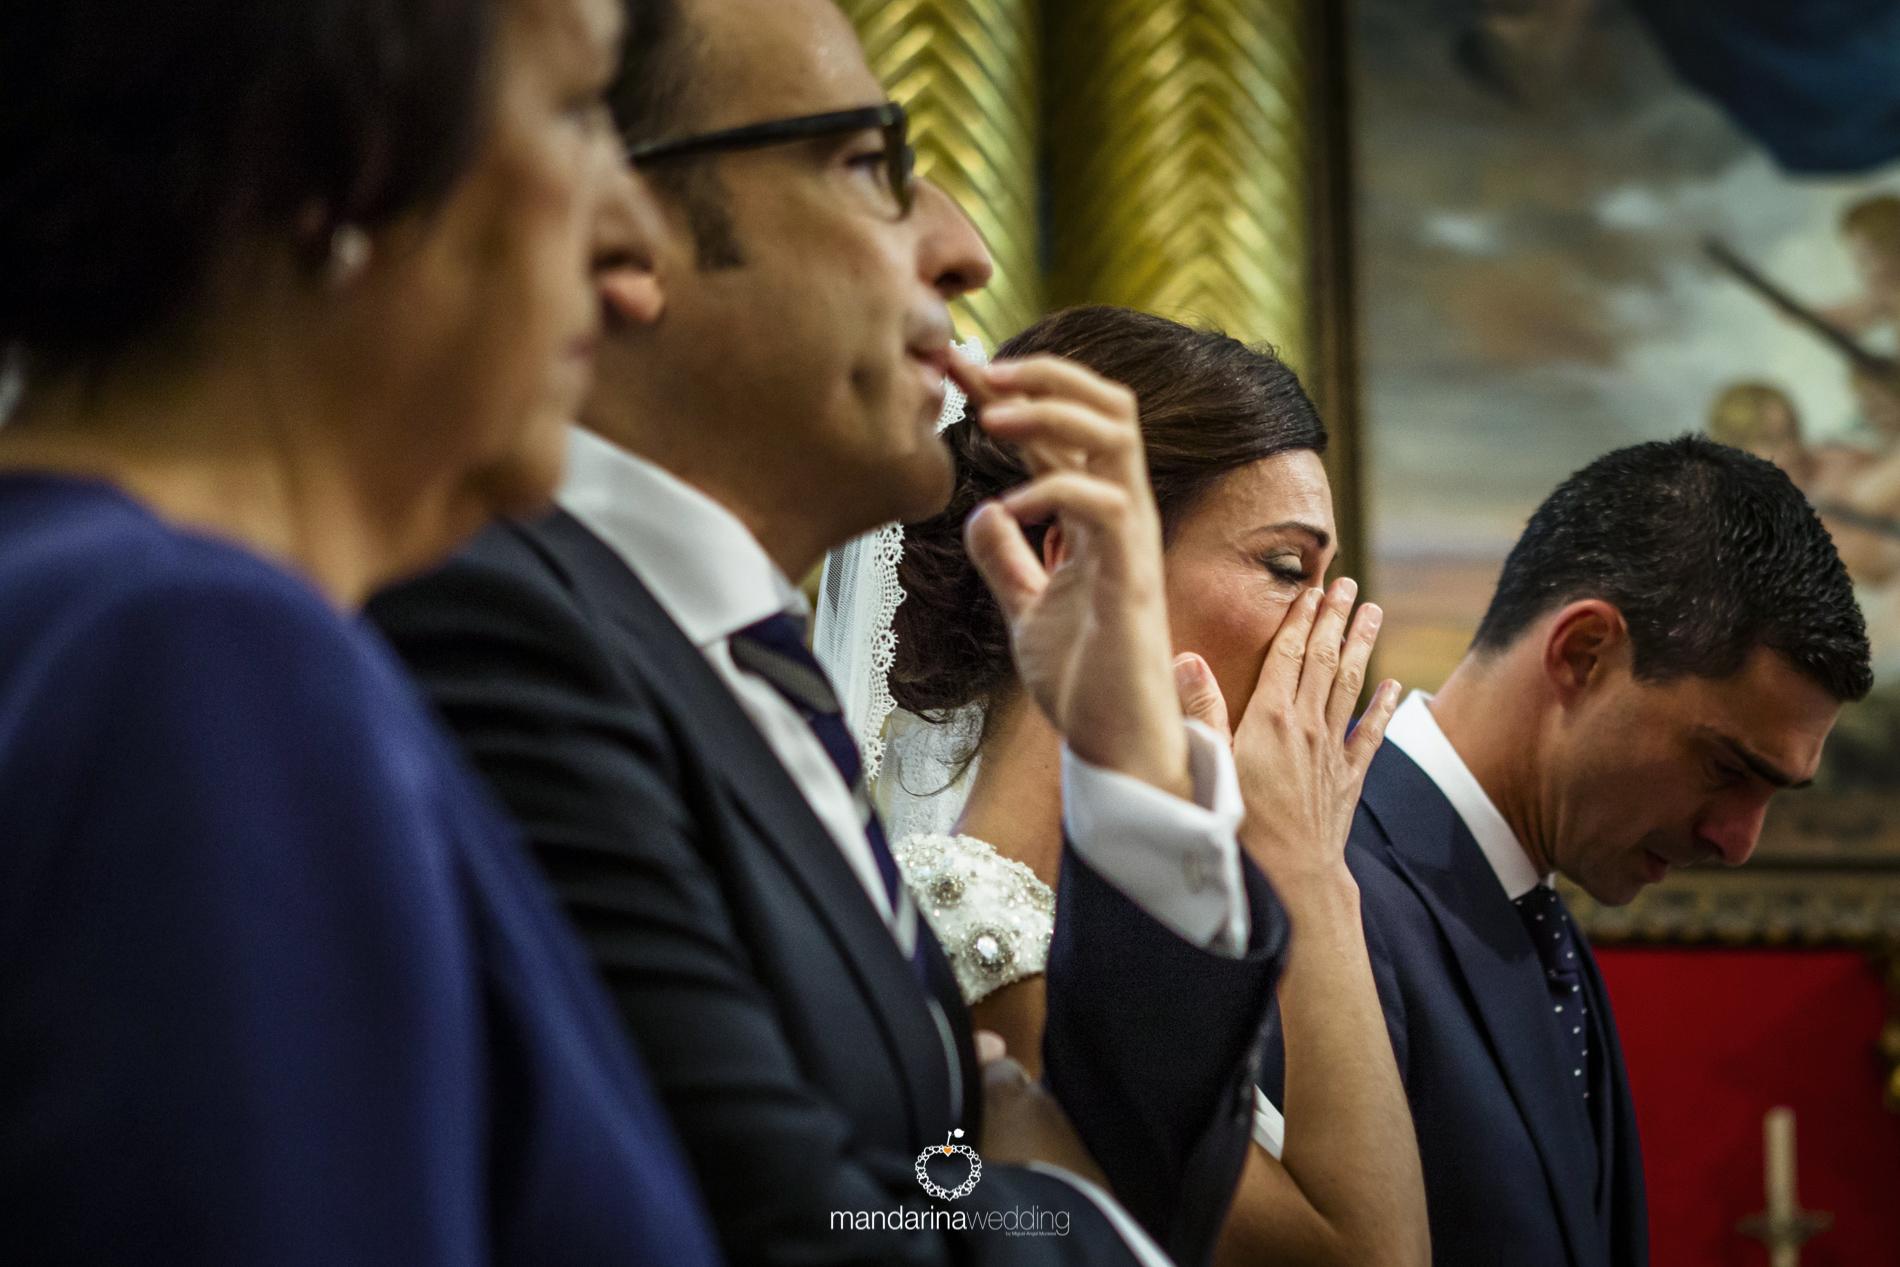 mandaria wedding, fotografos de boda, fotoperiodismo de boda, mejores fotografos de boda, bodas soria, bodas pirineo, bodas Madrid, fotógrafos tarragona_22